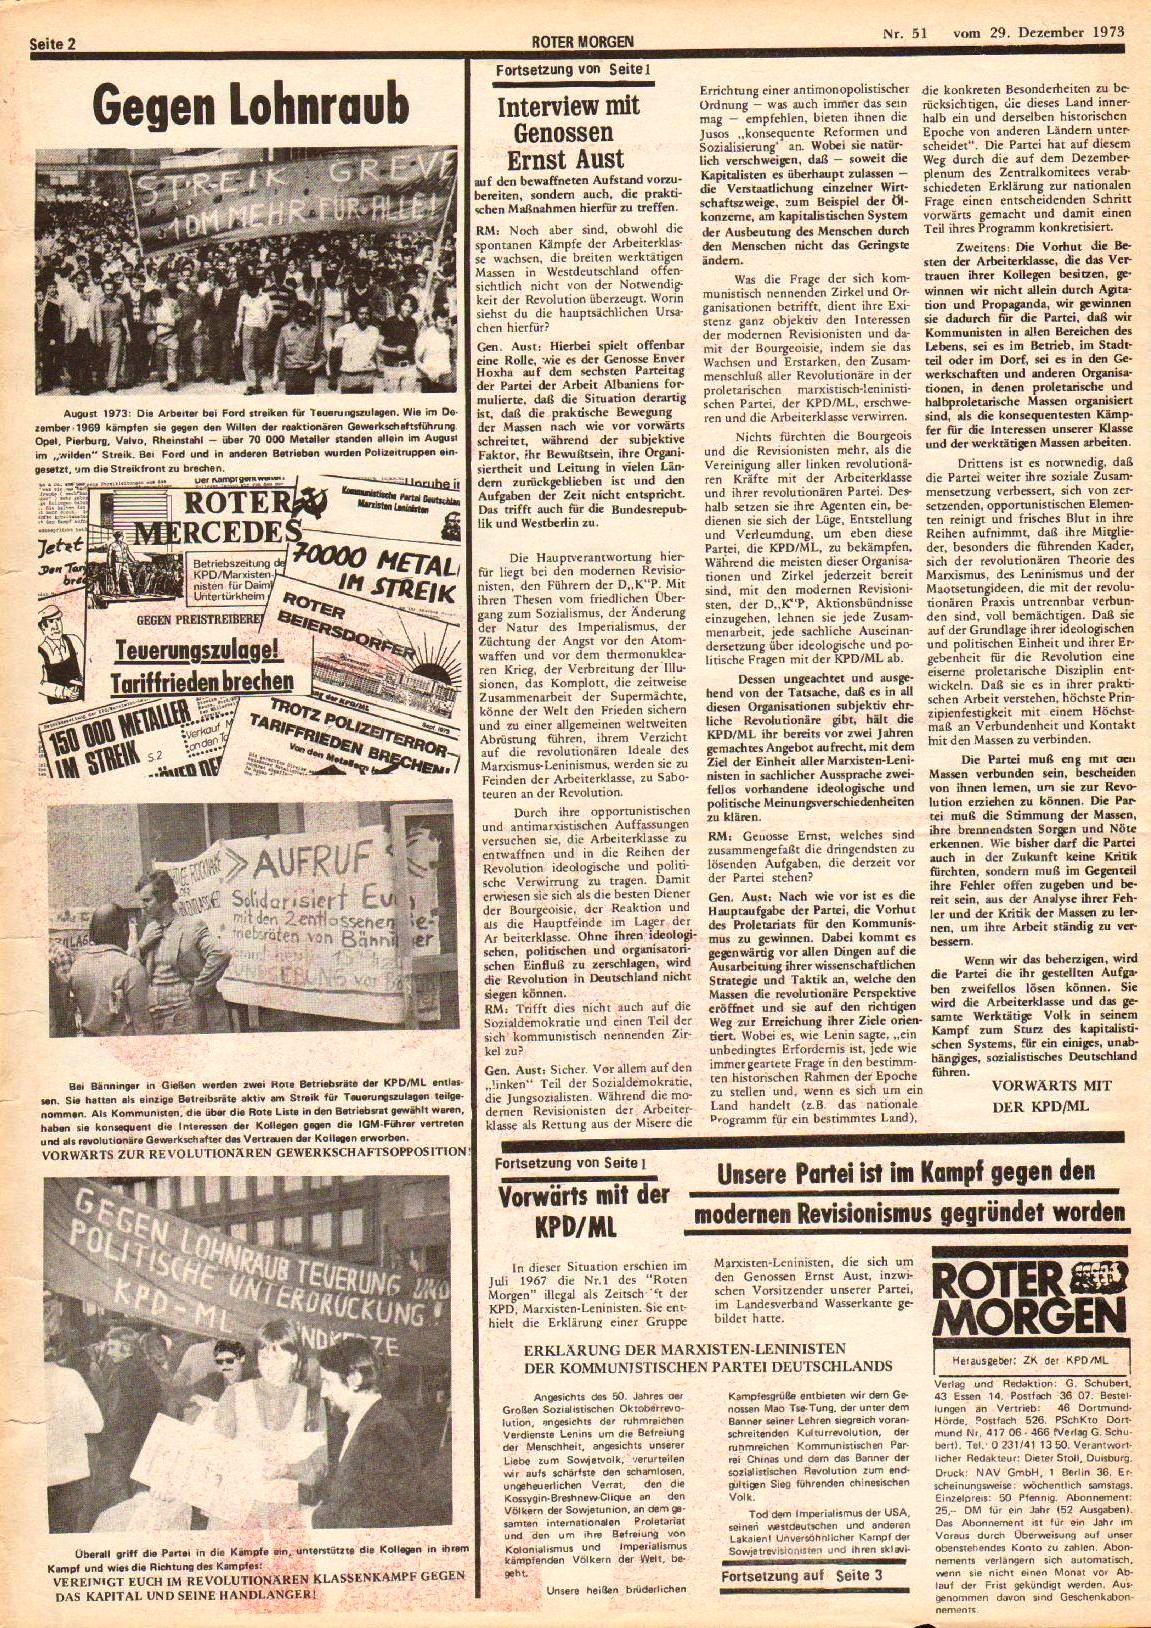 Roter Morgen, 7. Jg., 29. Dezember 1973, Nr. 51, Seite 2